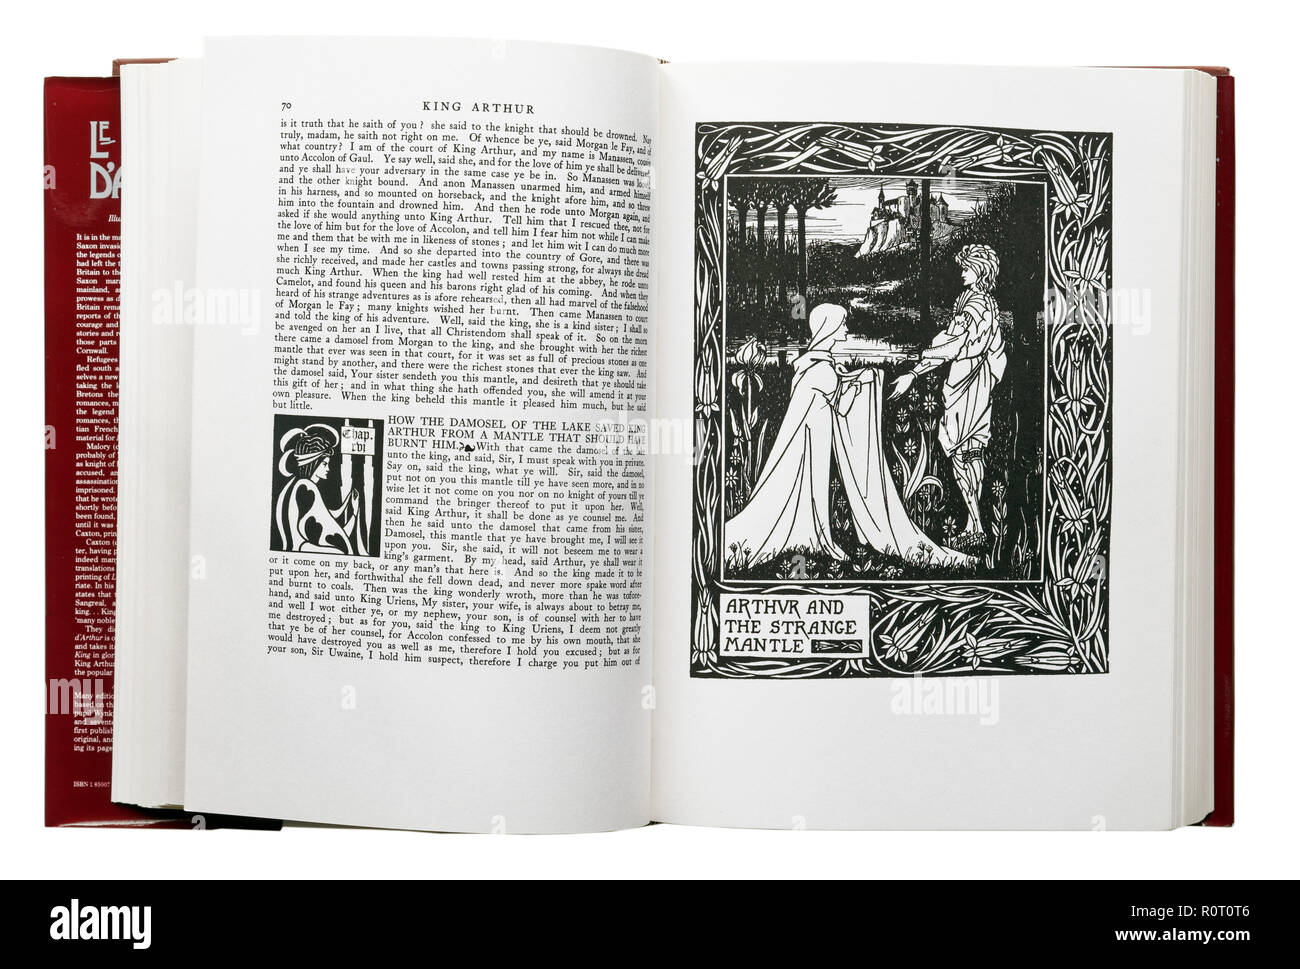 Le Morte d'Arthur by Sir Thomas Malory. Illustration Arthur and the Strange Mantle by Aubrey Beardsley - Stock Image